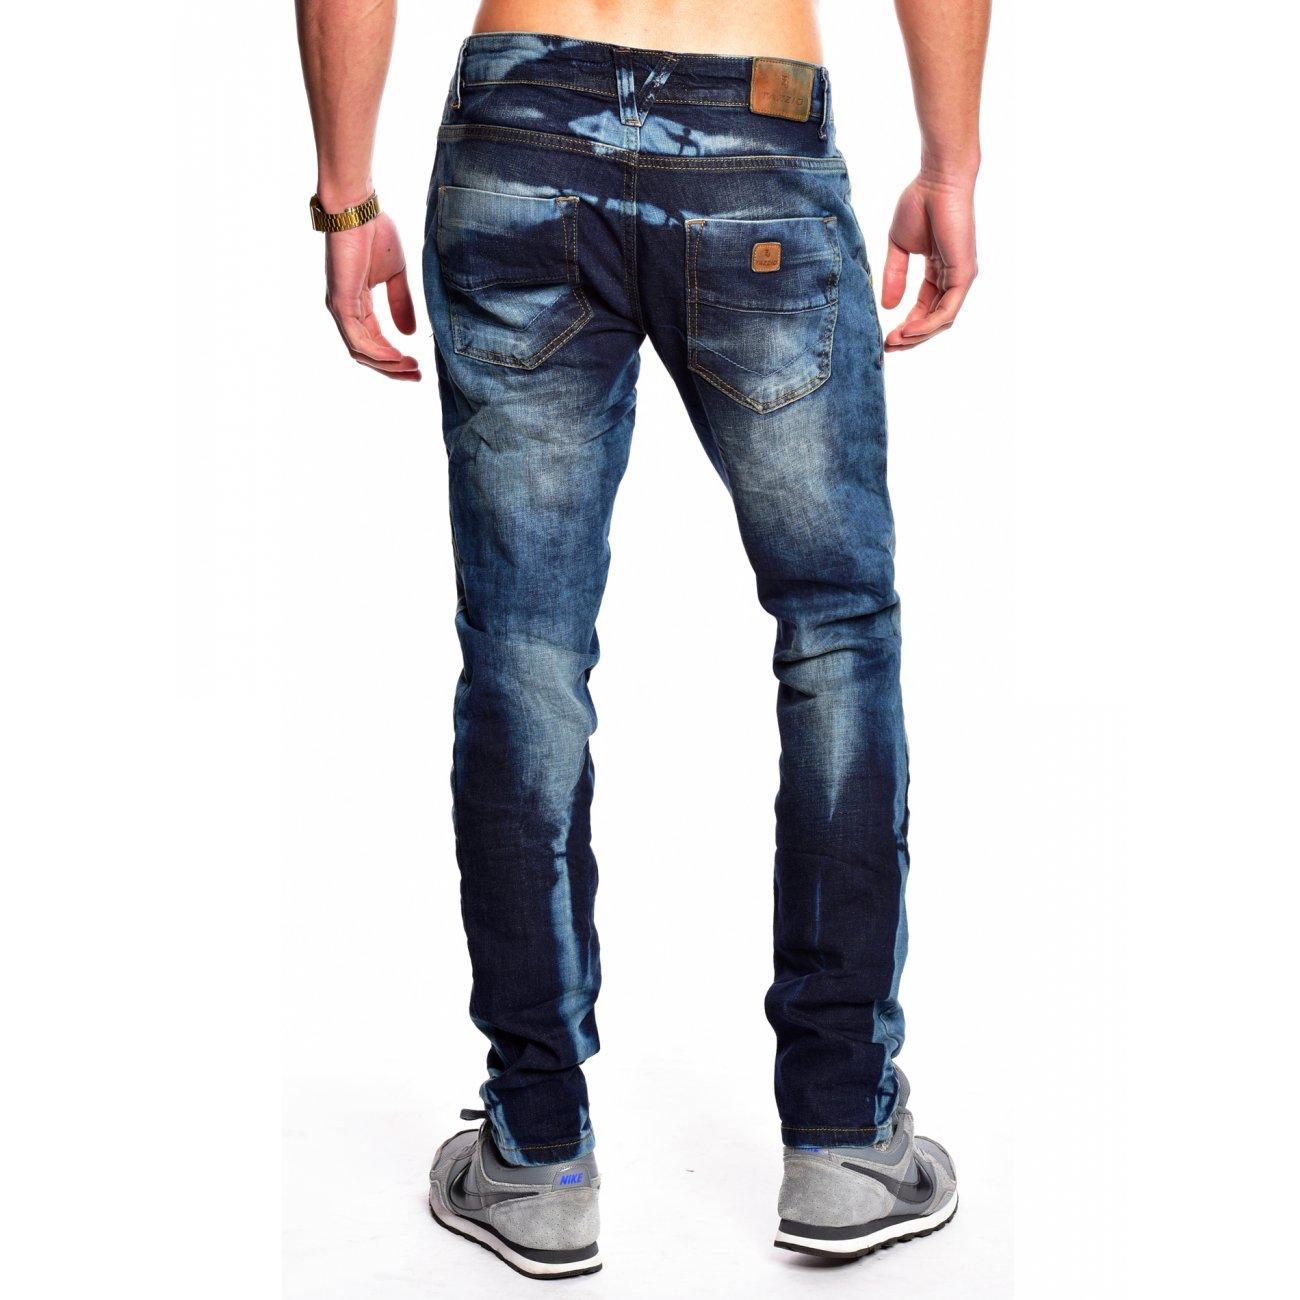 herren jeans blau tazzio 503 jeans herren g nstig kaufen. Black Bedroom Furniture Sets. Home Design Ideas